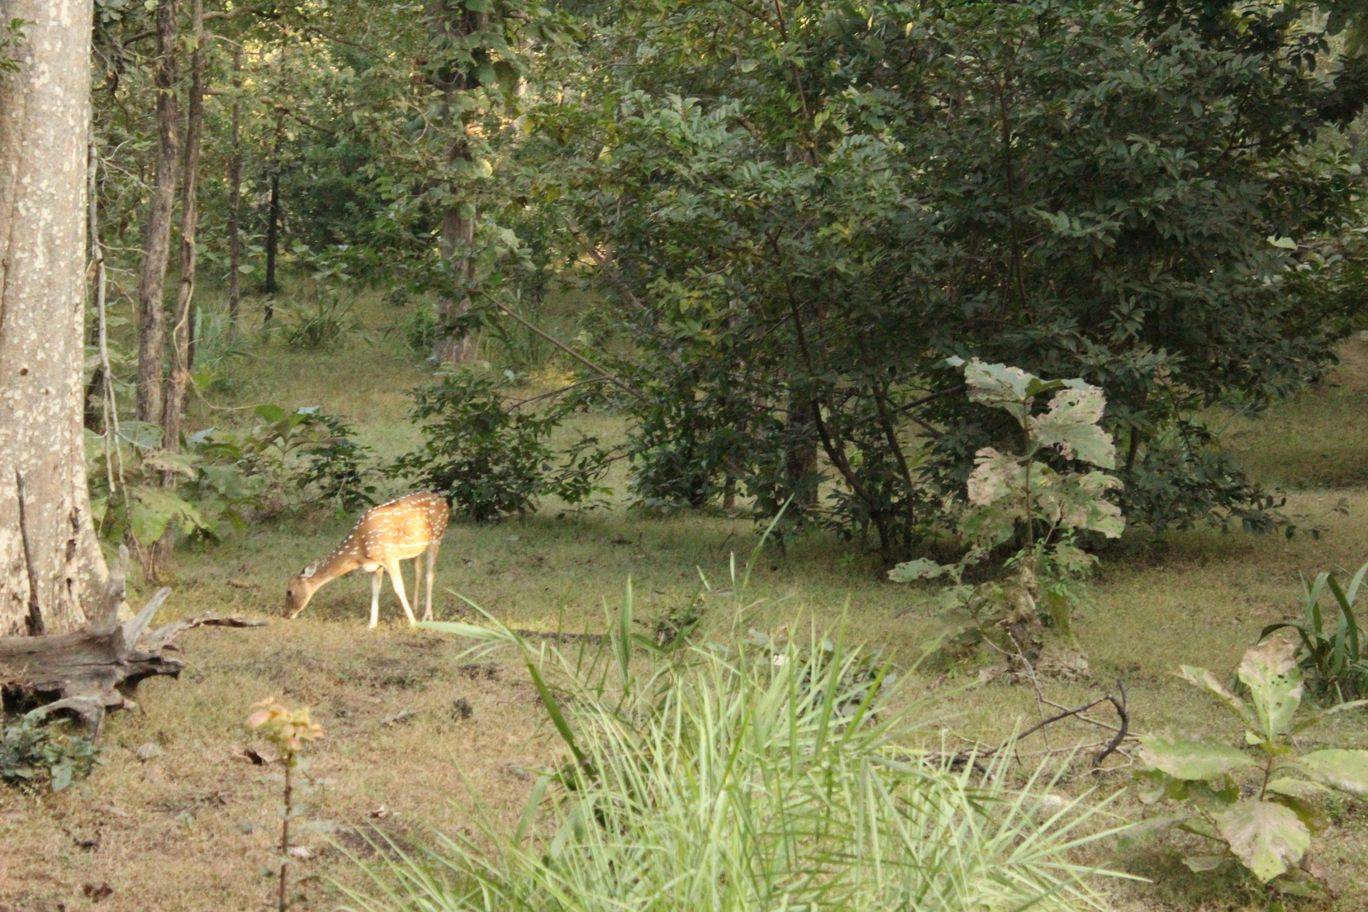 Photo of Nagzira Tiger-Reserve- Guest House By Amit Belekar